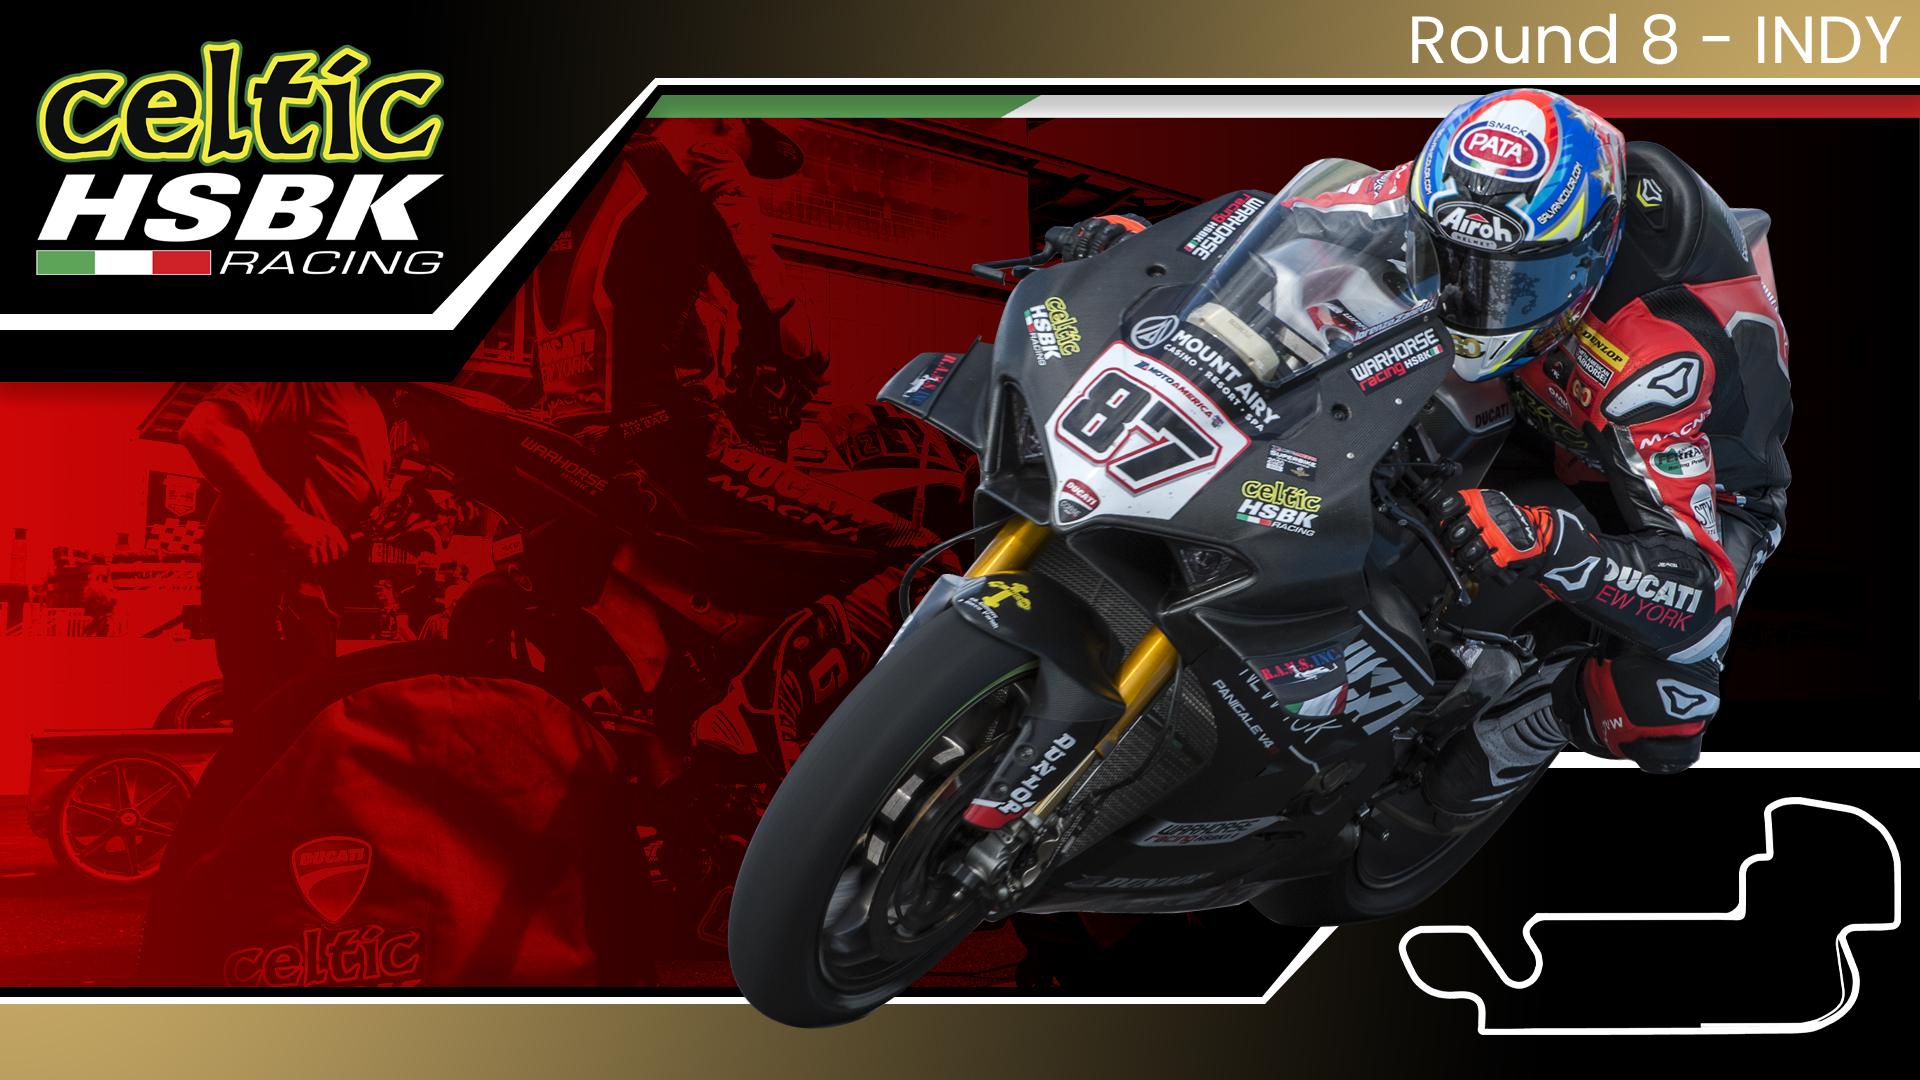 Celtic HSBK Racing scores first Ducati SBK win since 2010 (2020 MotoAmerica Round 8)